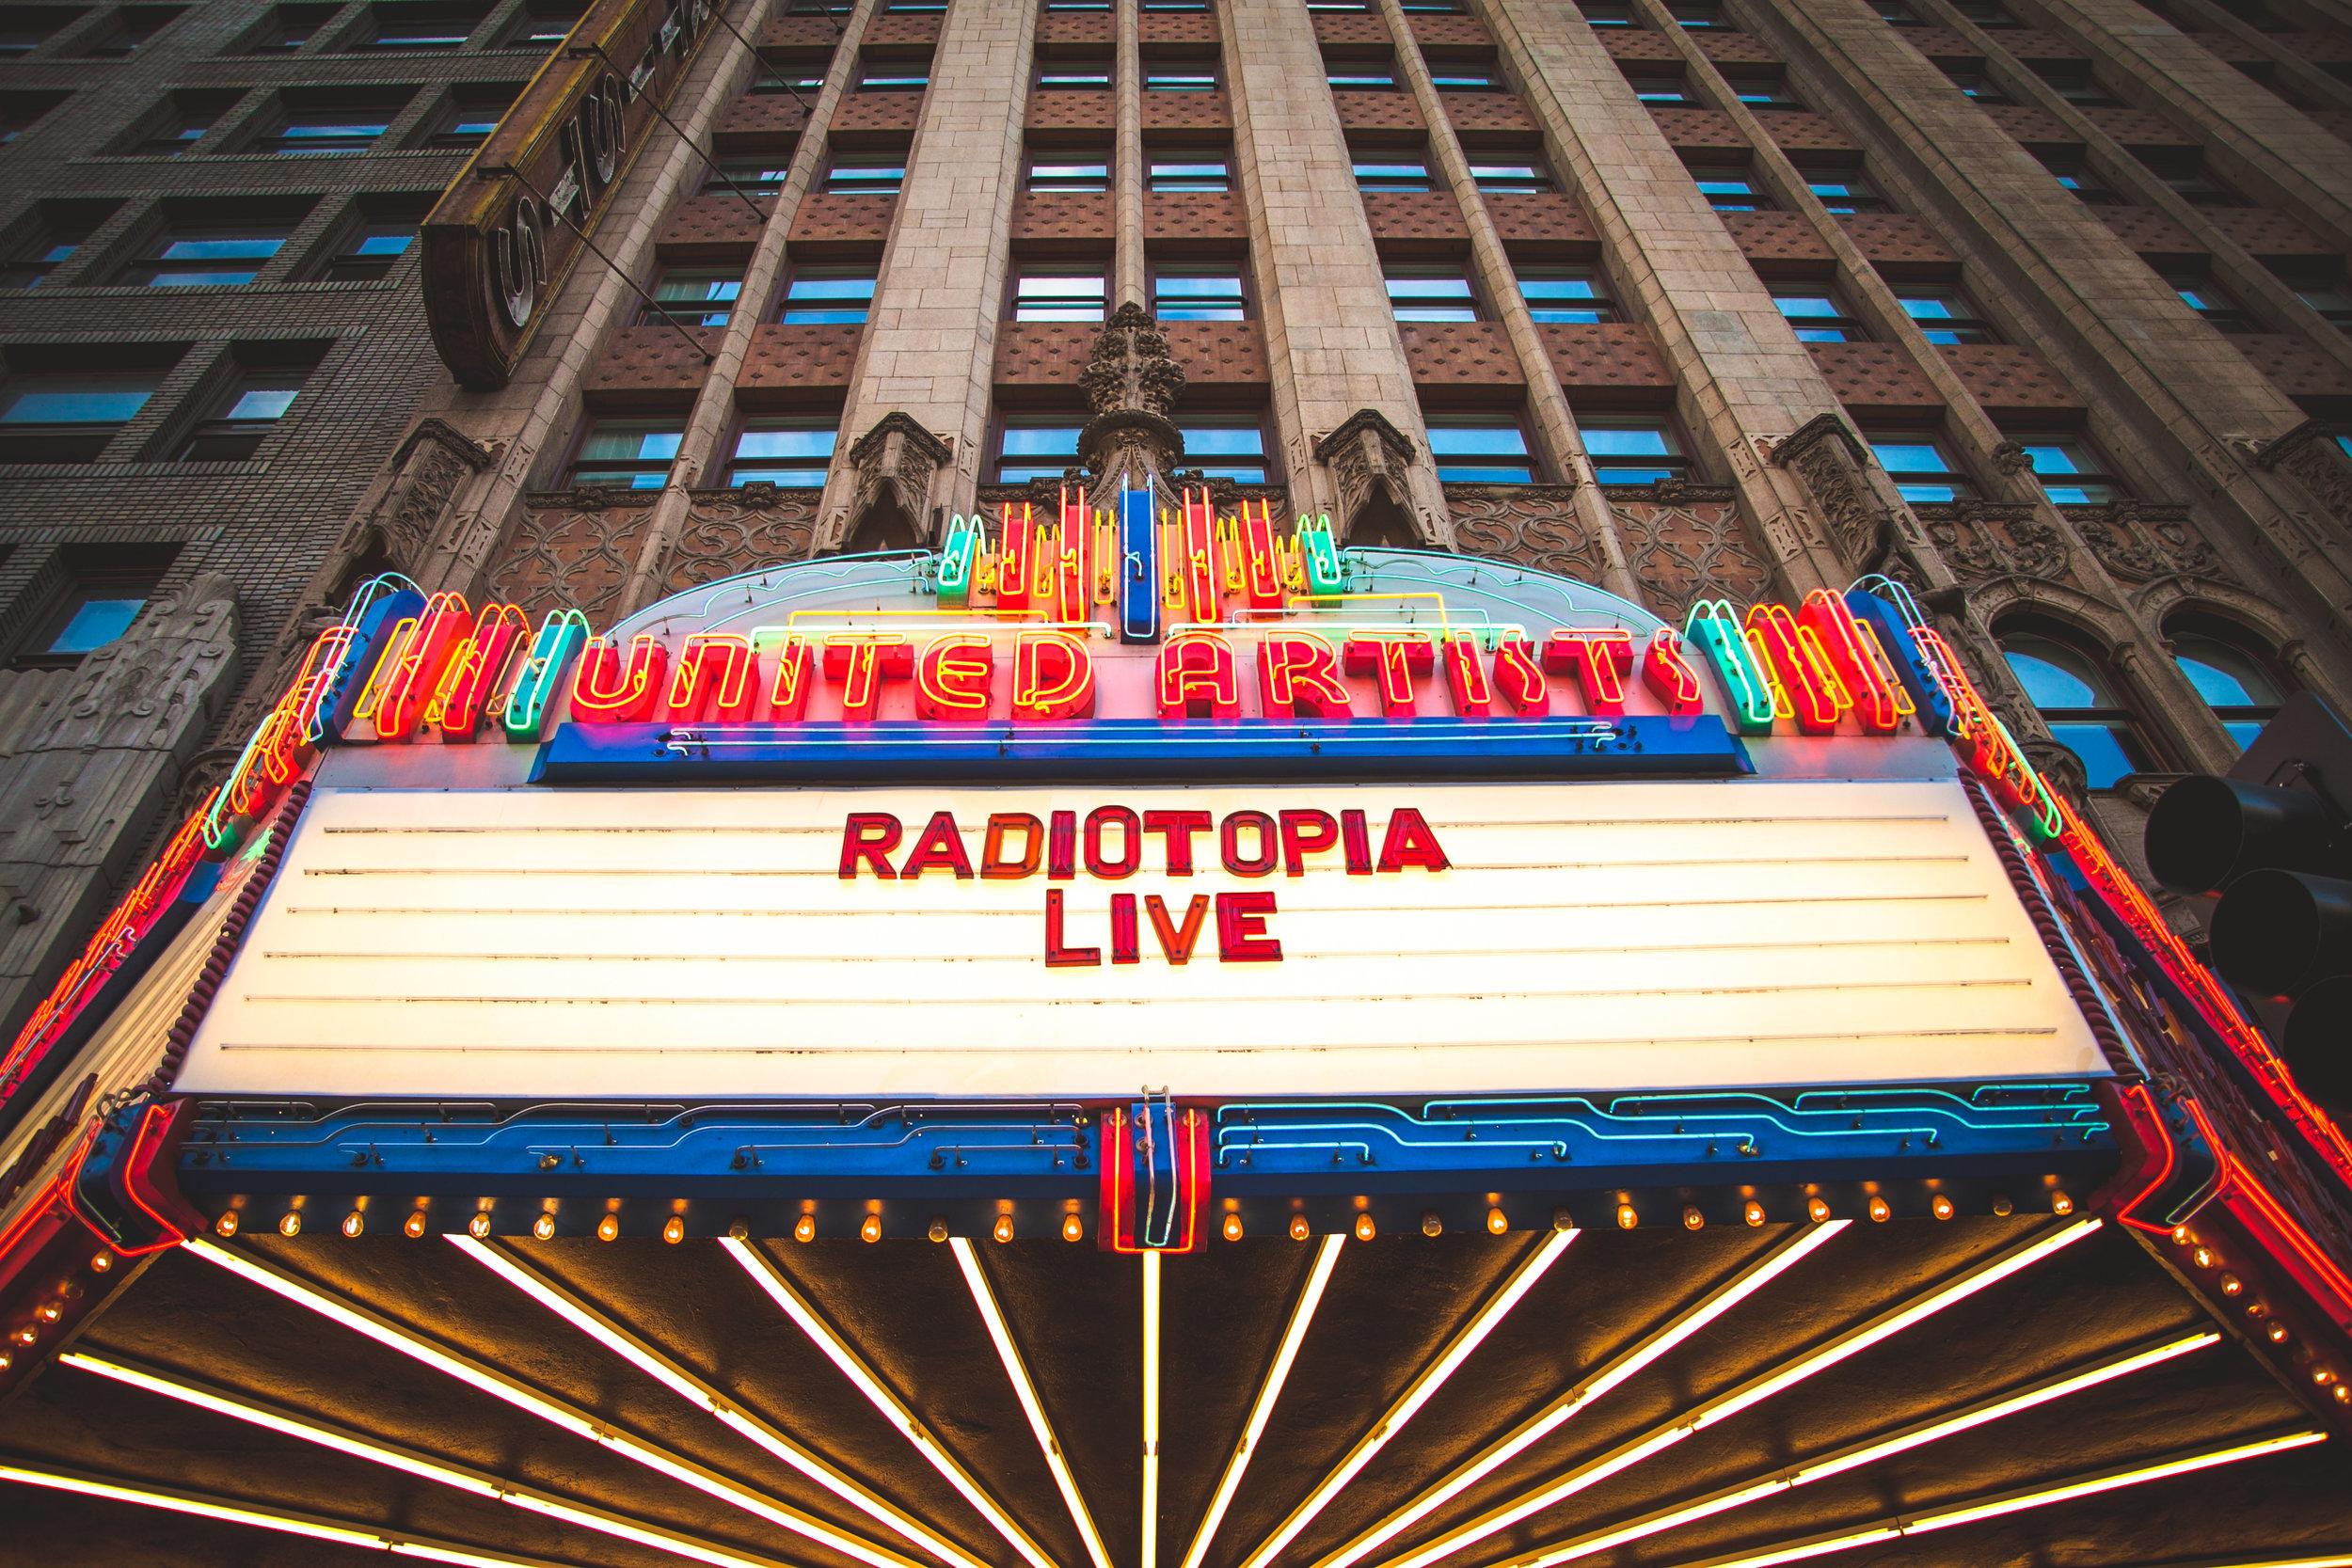 Radiotopia Live Marquee.jpg